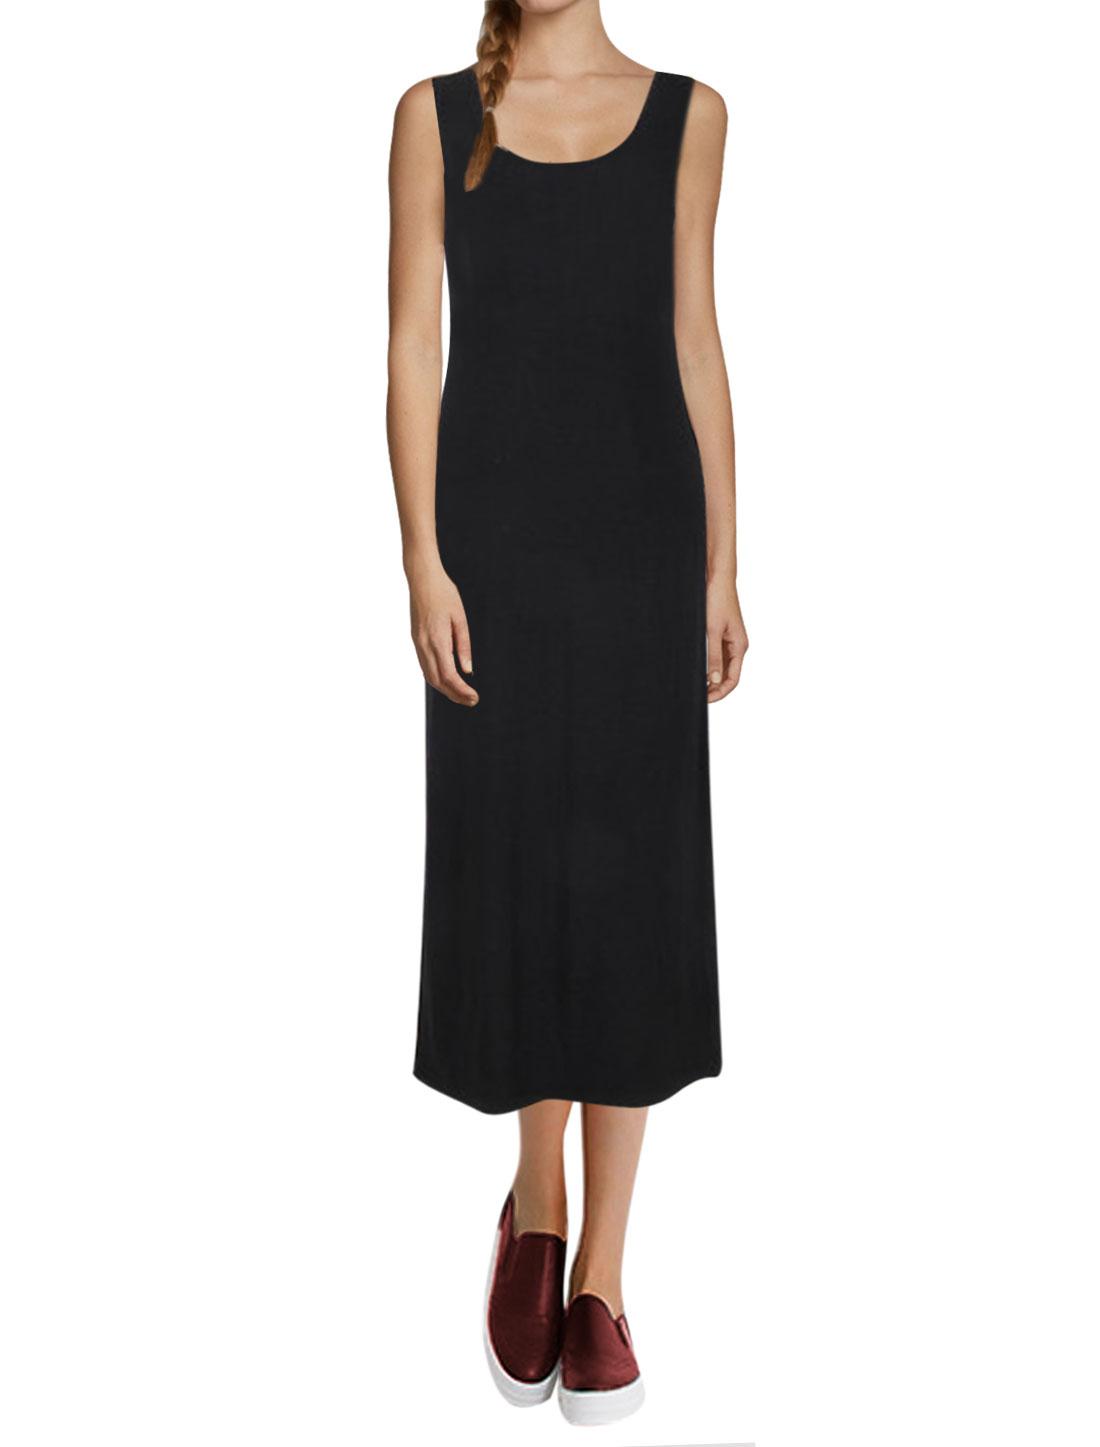 Women Scoop Neck Sleeveless Crochet Back Unlined Midi Dress Black M